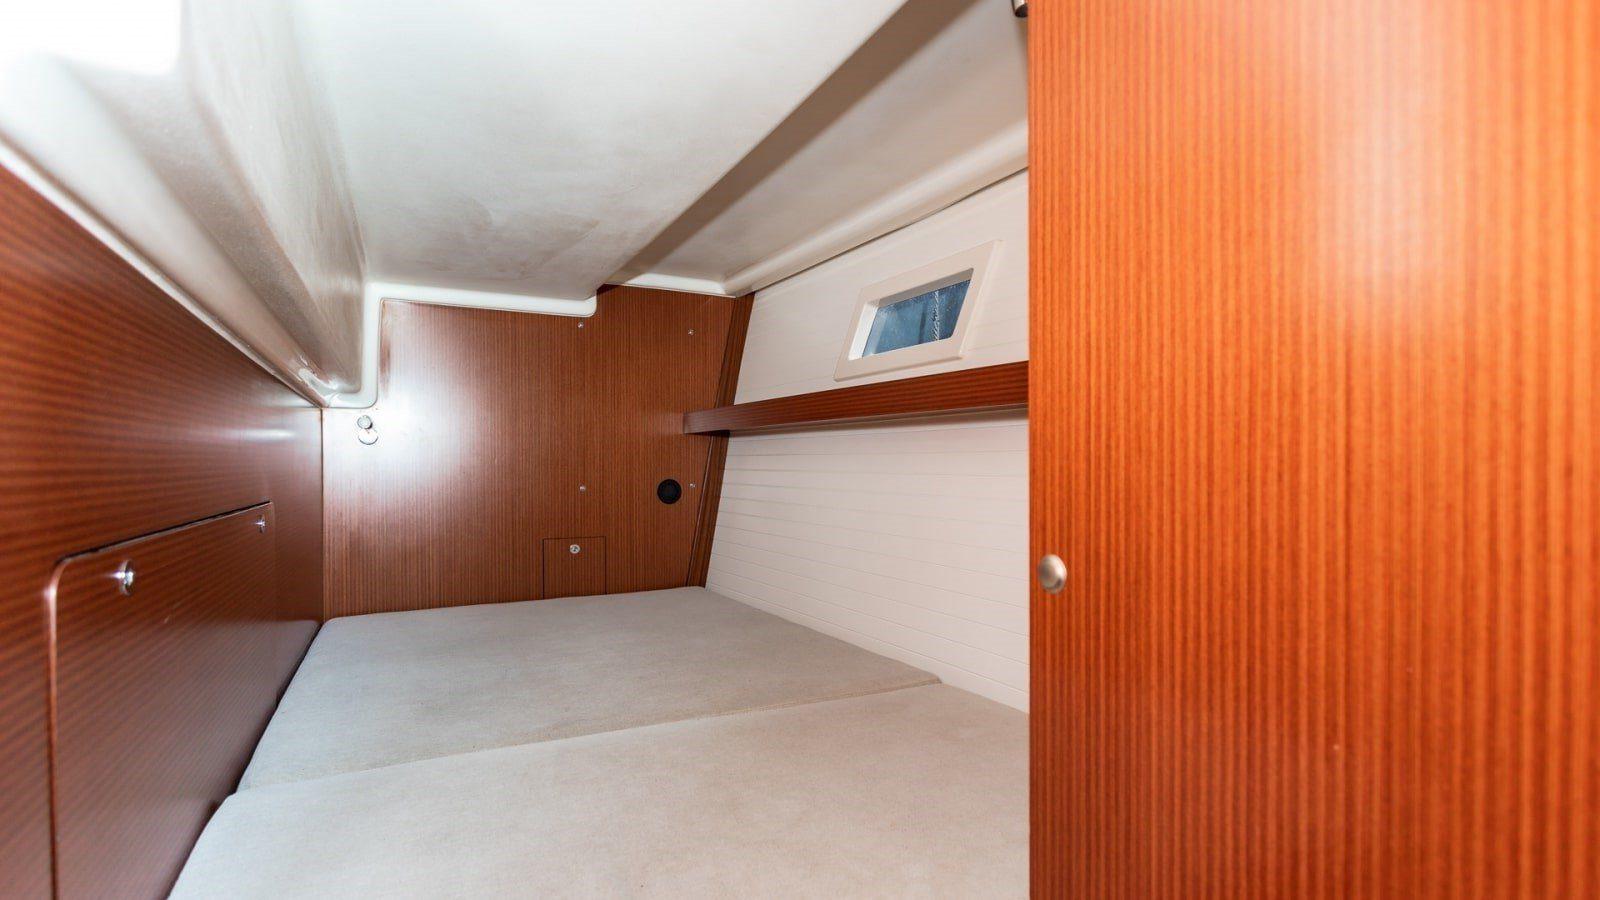 nautika 1300 czarter jachtu motorowego kabina